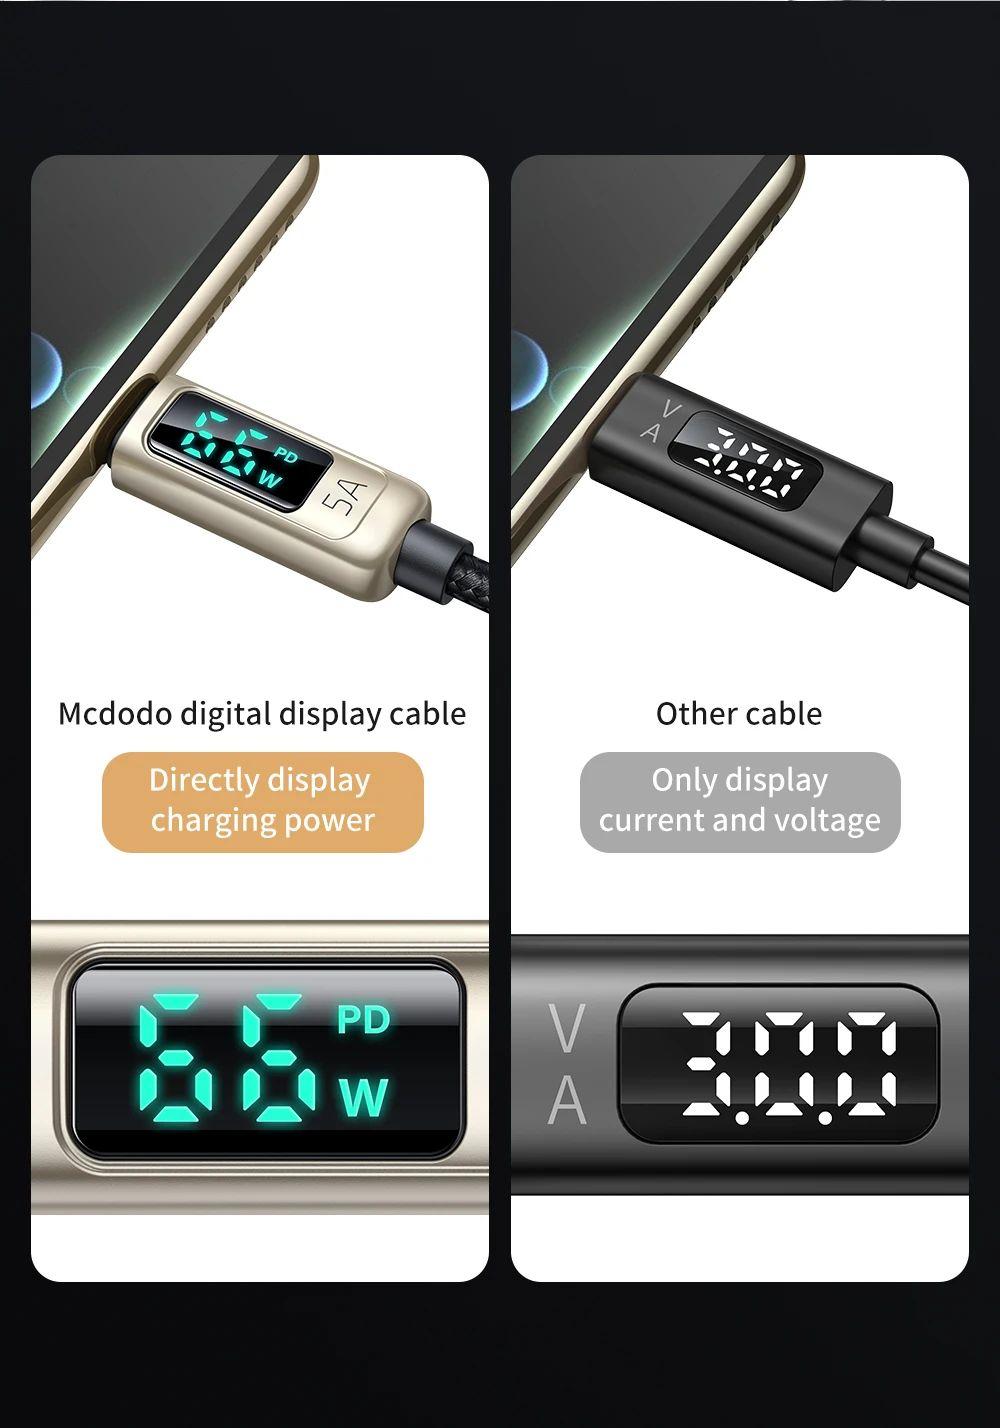 Mcdodo Ca8690 Digital Pro Type C 5a Data Cable (1)